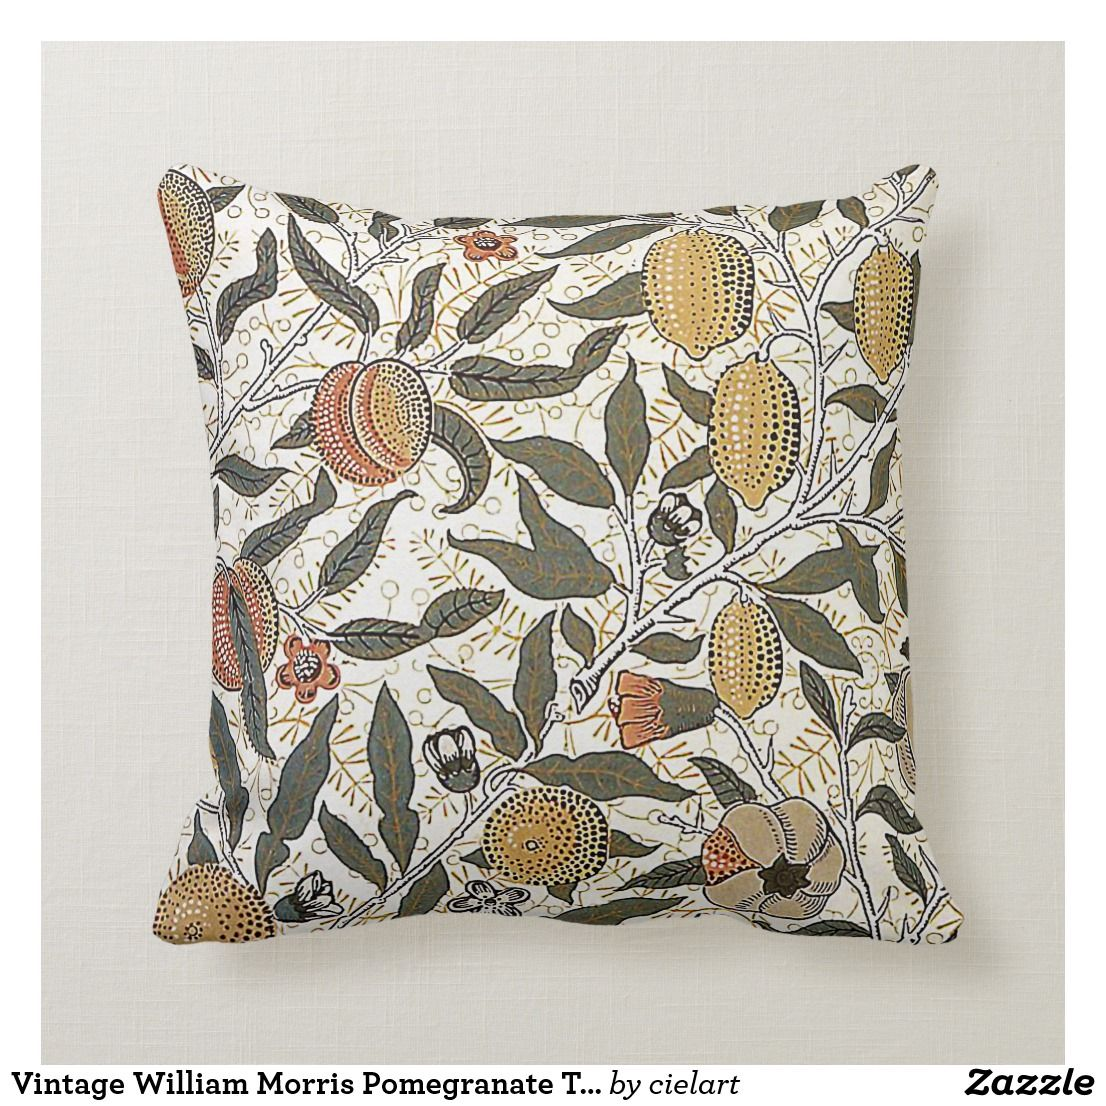 Vintage William Morris Pomegranate Throw Throw Pillow Zazzle Com